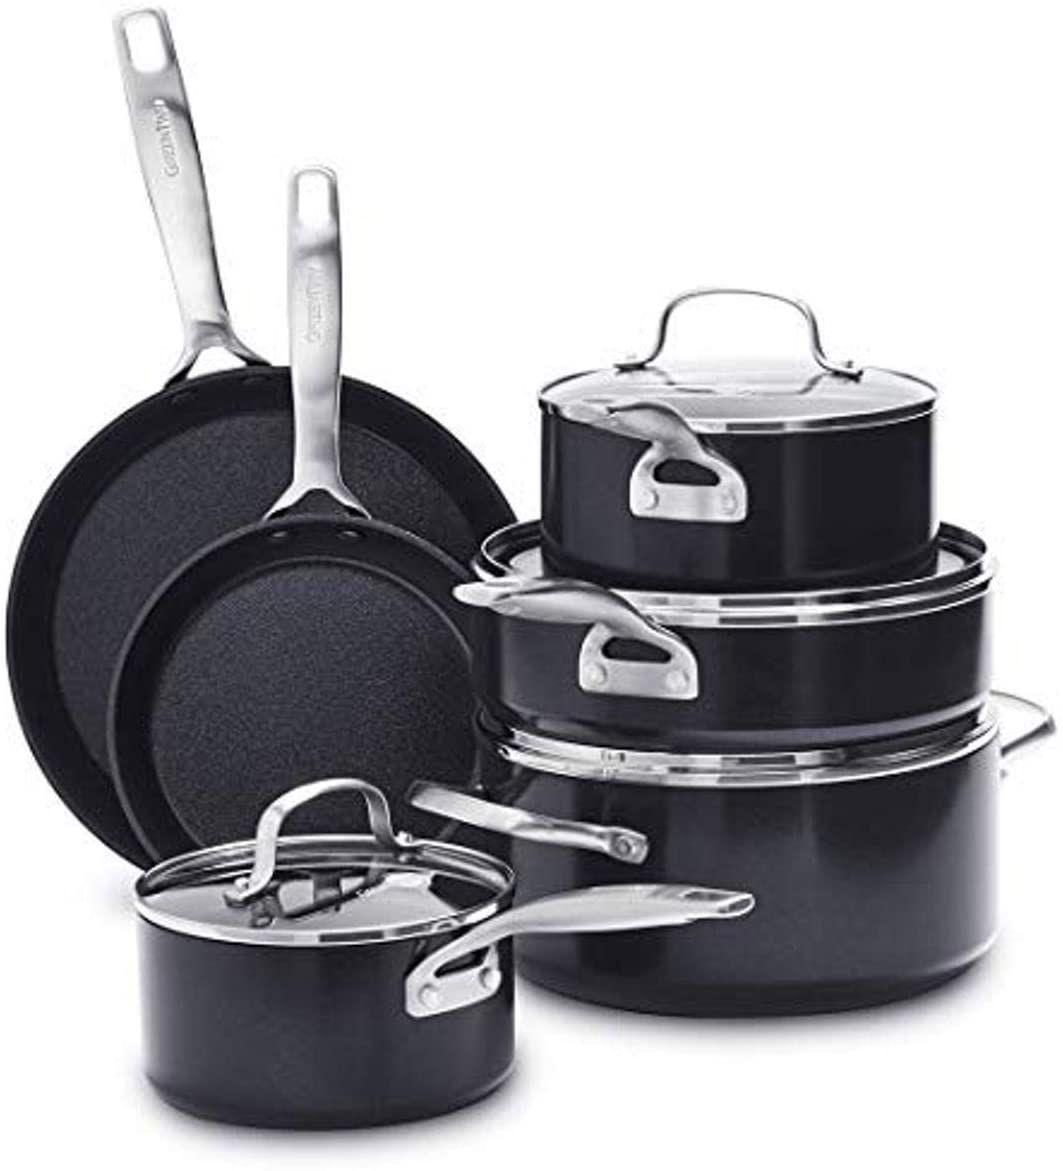 greenpan-searsmart-ceramic-nonstick-cookware-set